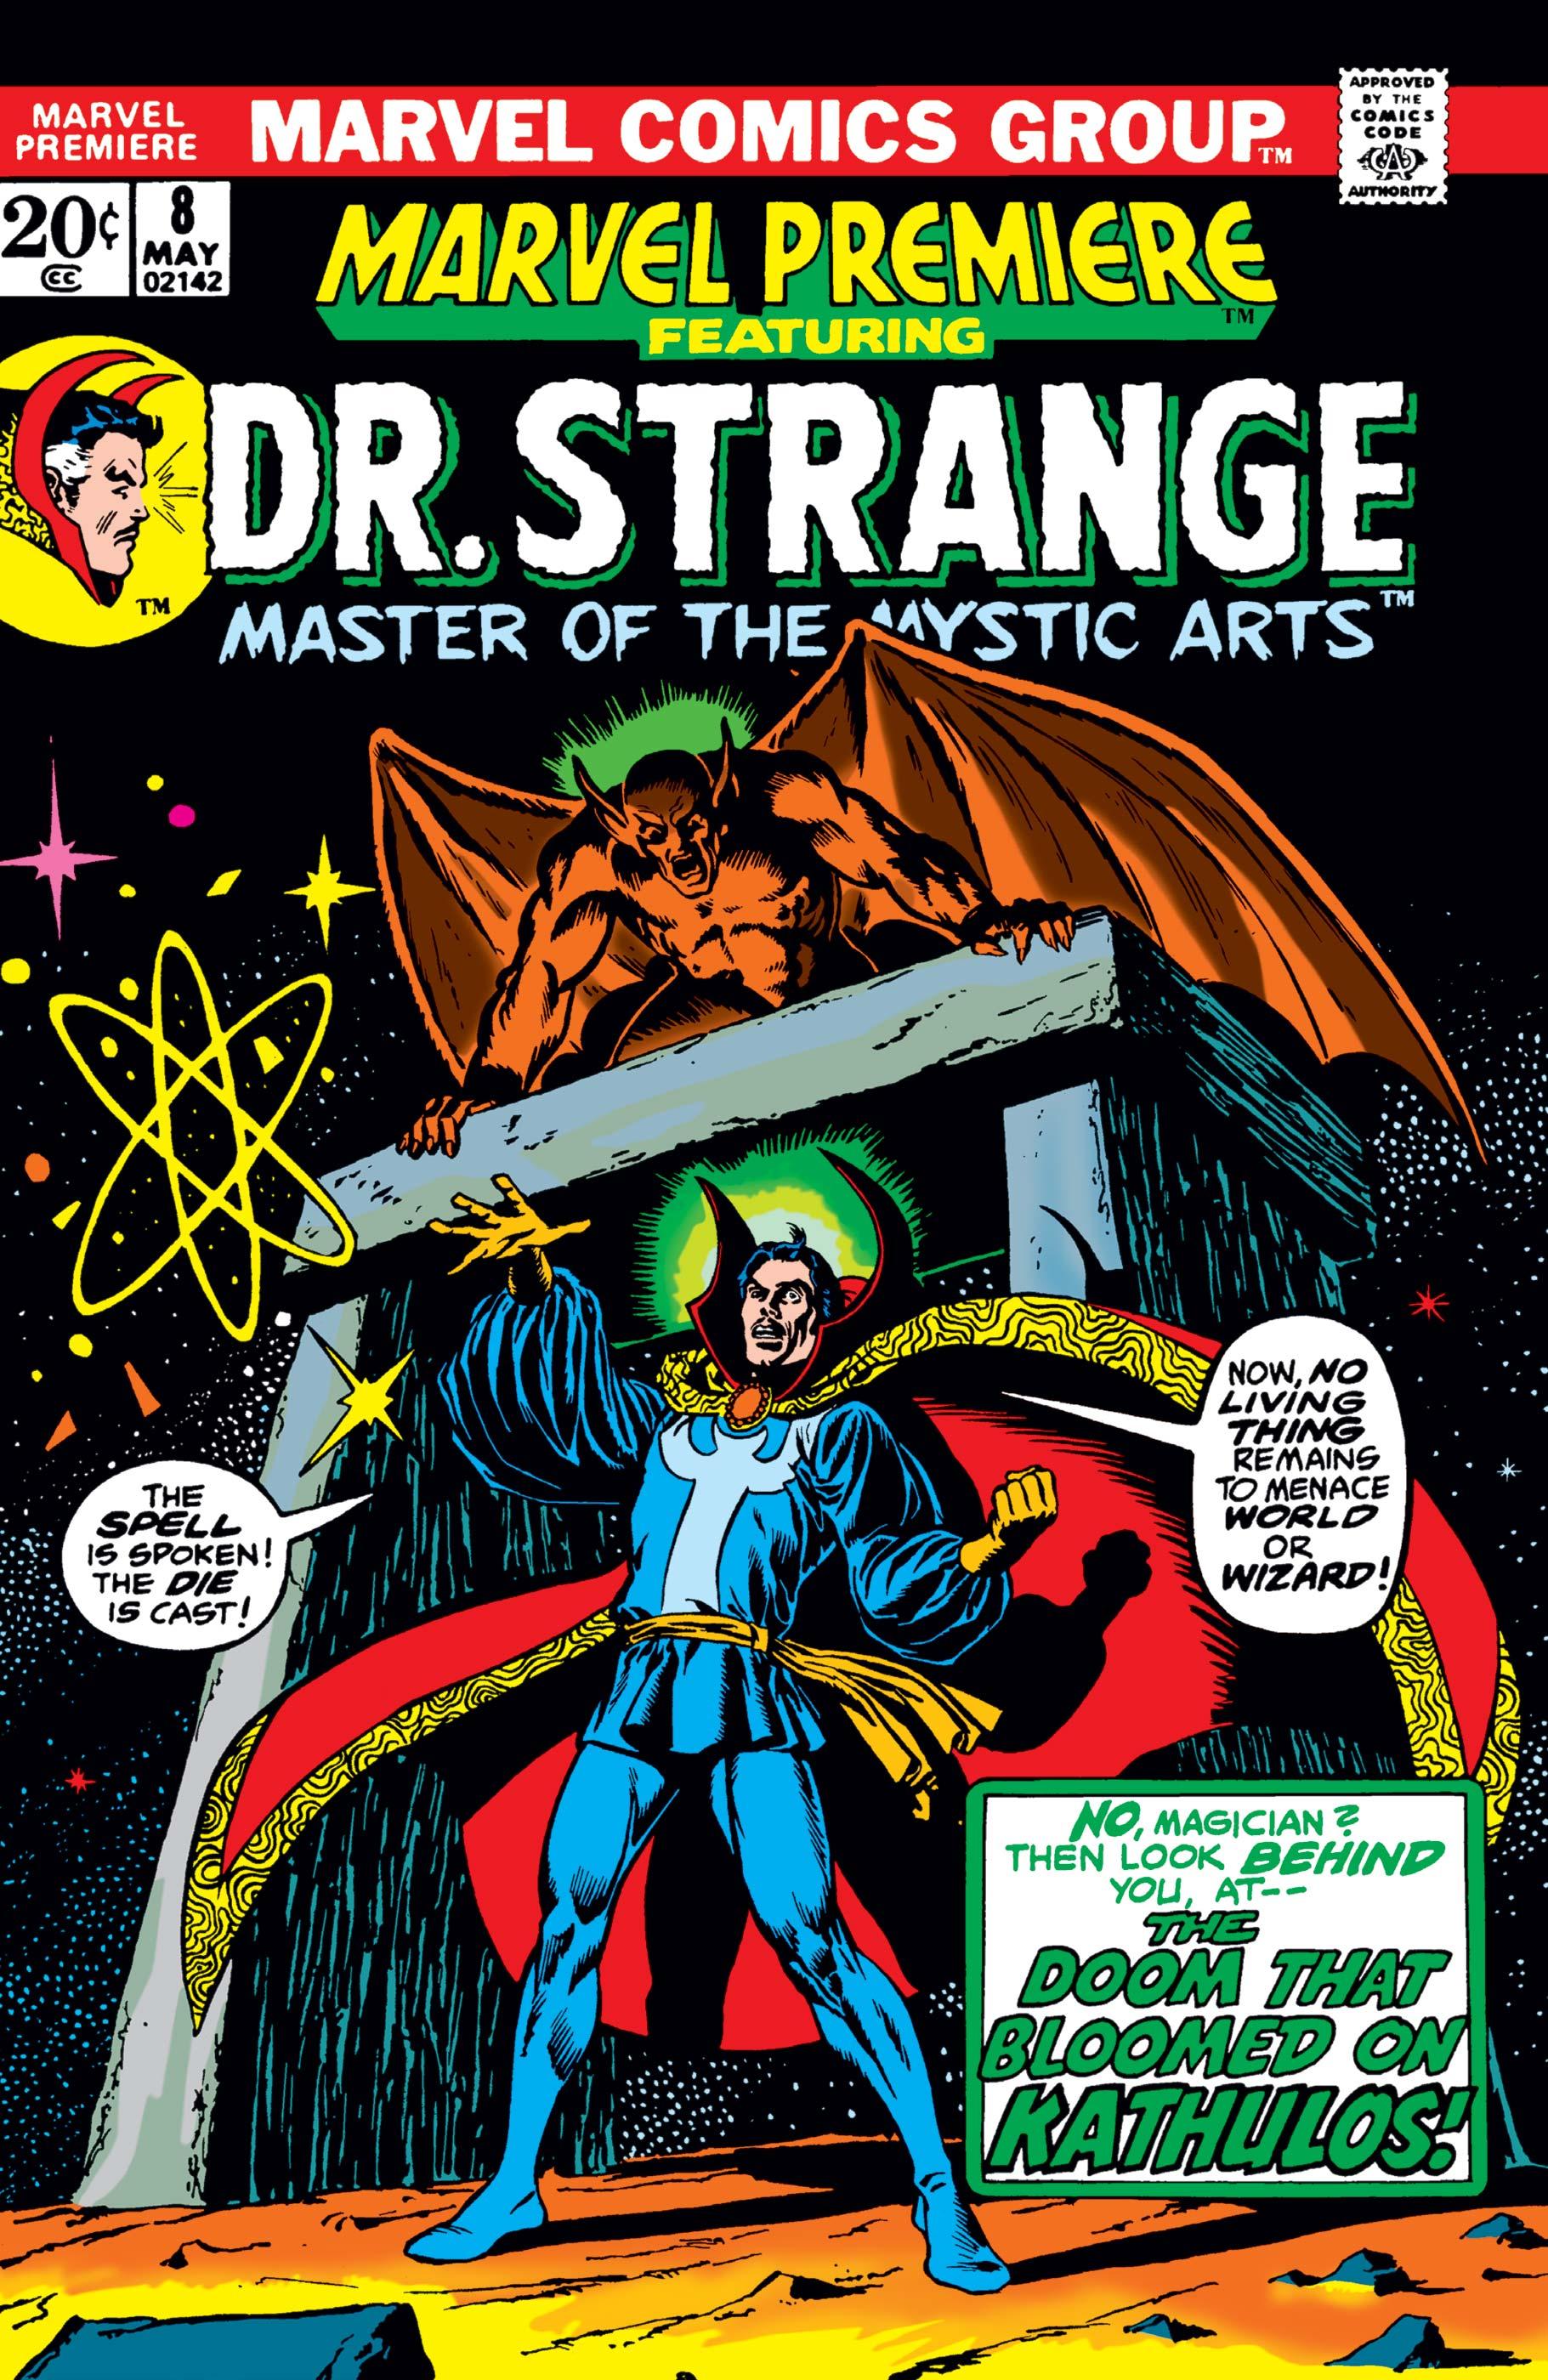 Marvel Premiere (1972) #8